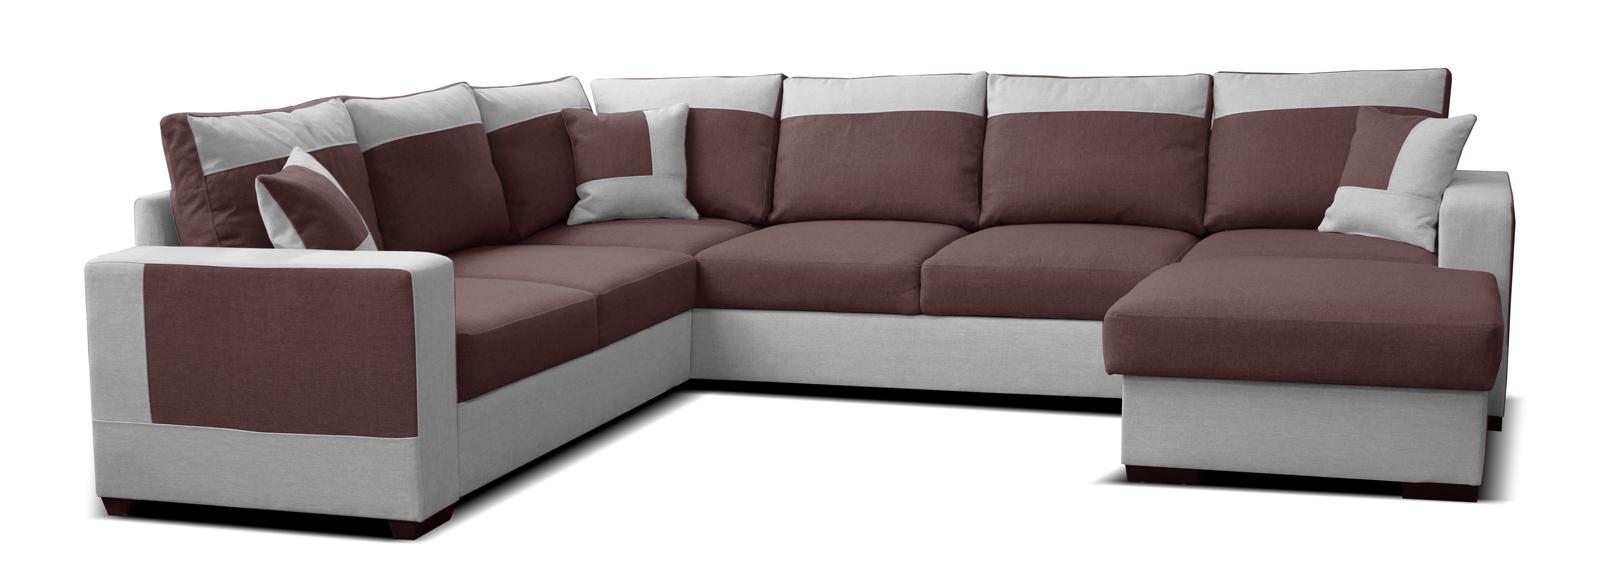 Rohová sedací souprava U - Po-Sed - Mega 2+A+2F+L (bordó + šedá) (P)